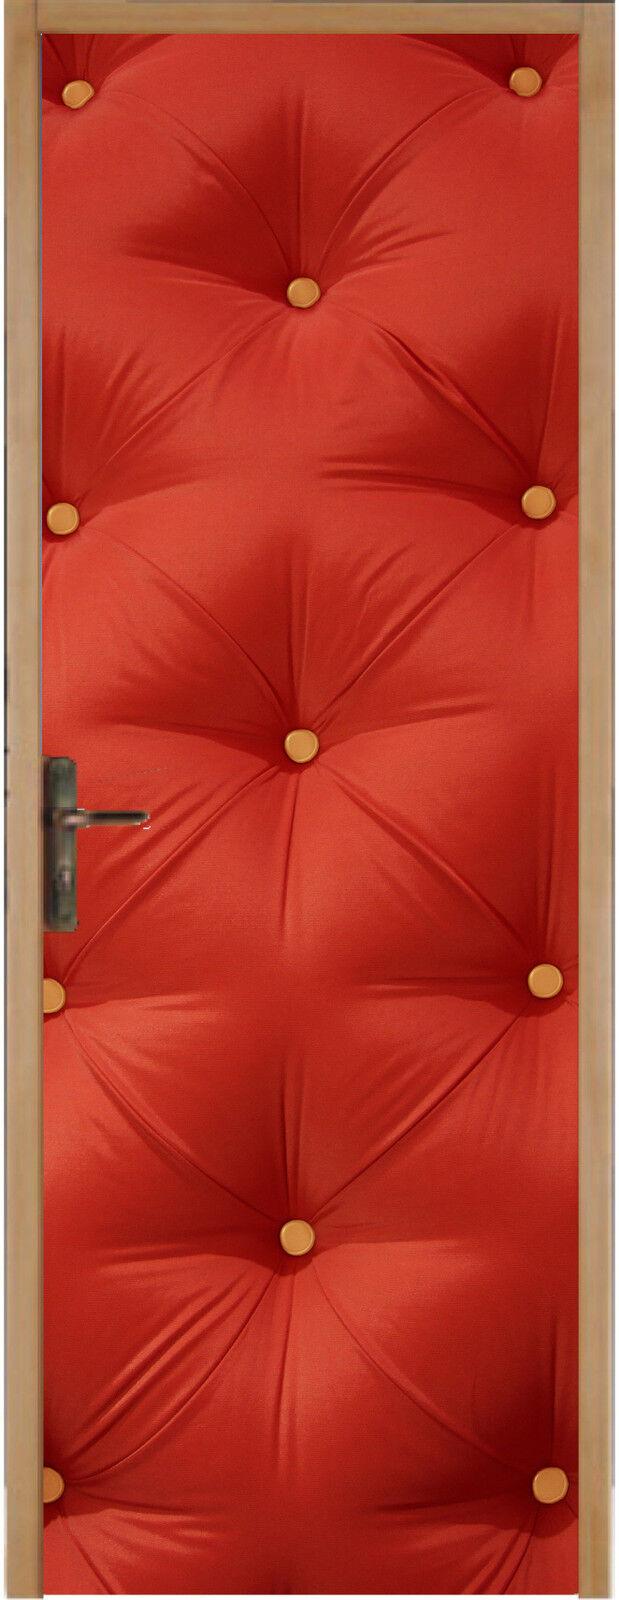 Adhesivo para Puerta Plana Capitoné 93x204cm Ref 313